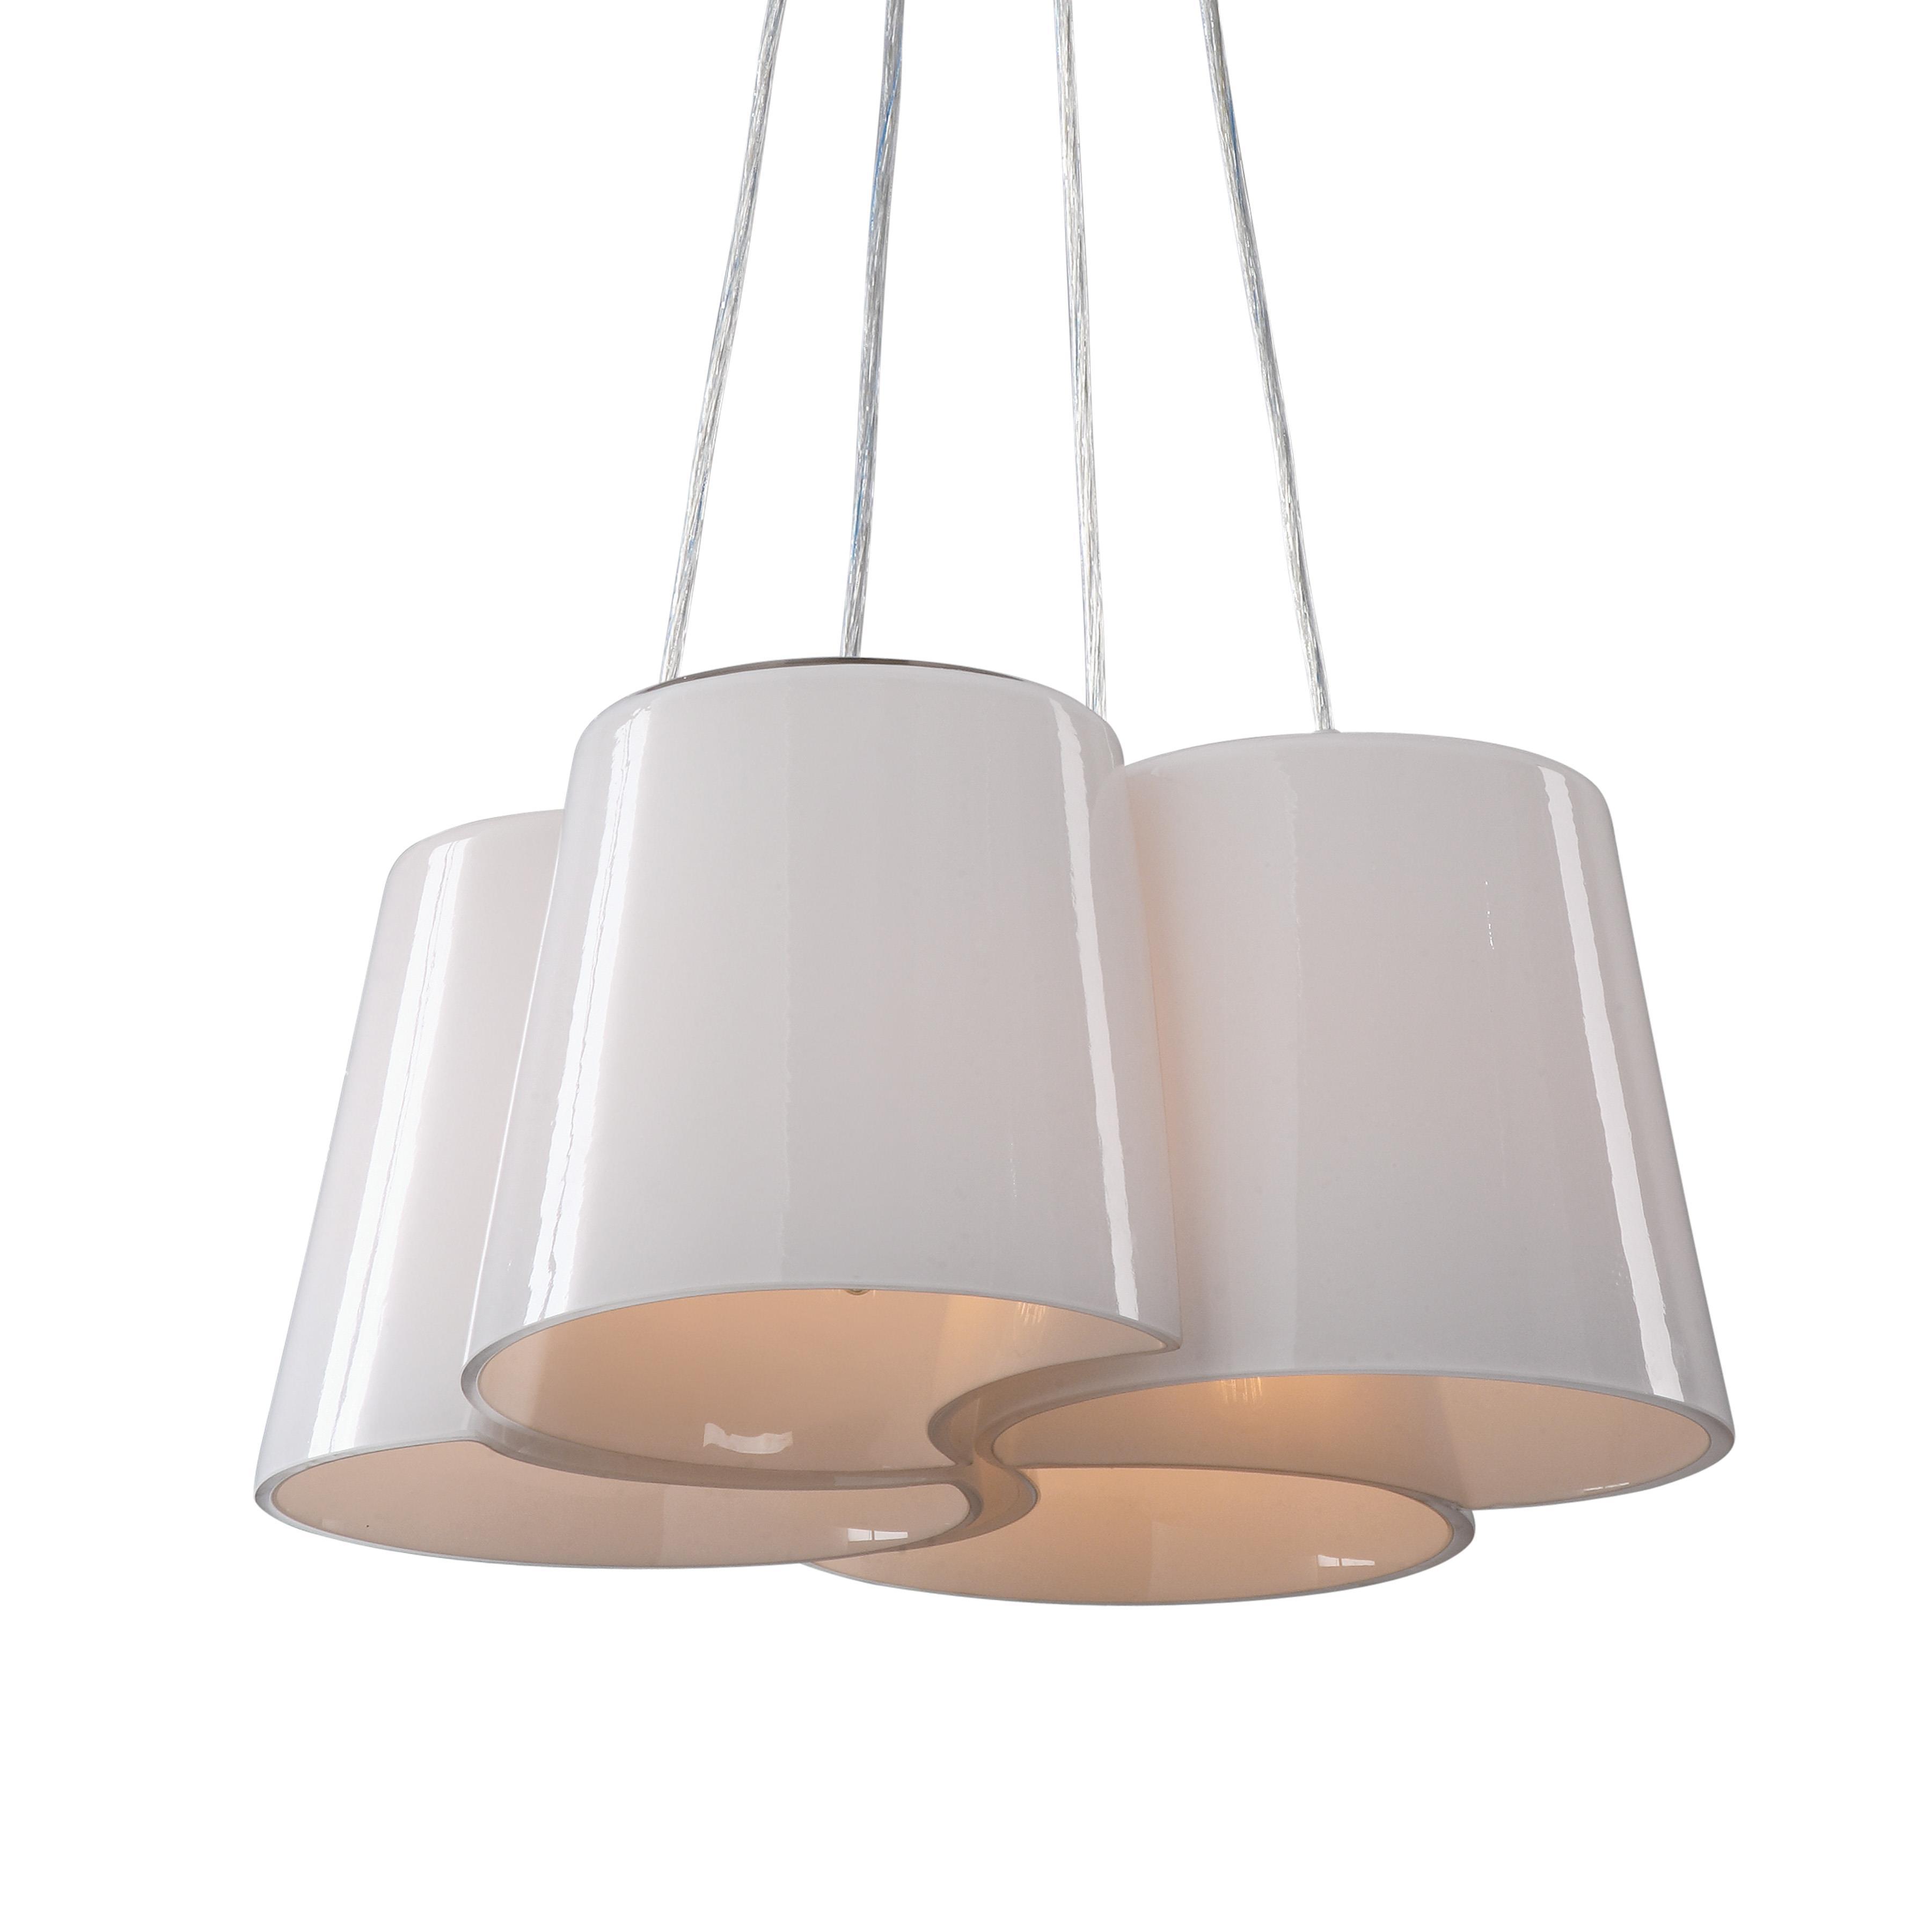 Uttermost Lighting Fixtures Botanic 4 Light Milk Glass Chandelier - Item Number: 21271